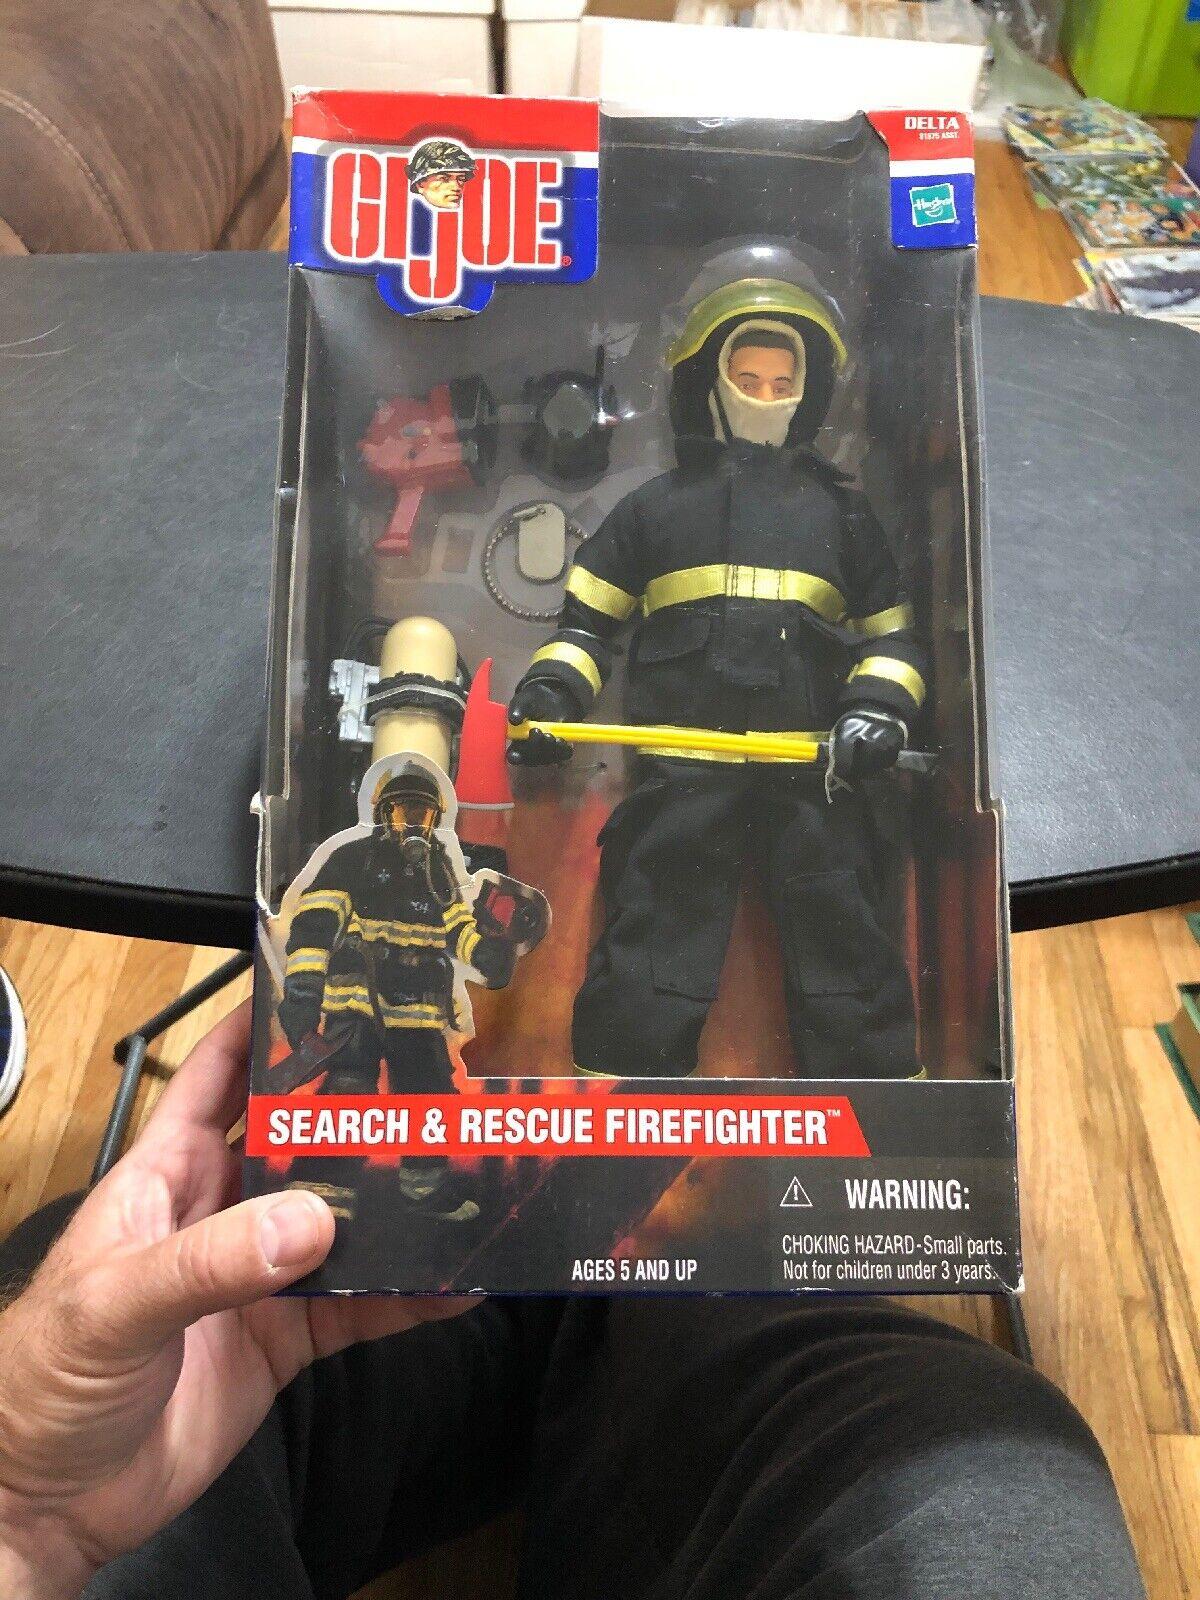 GI JOE Sesrch & Rescue FIREFIGHTER 2001 Figure In Box Rare